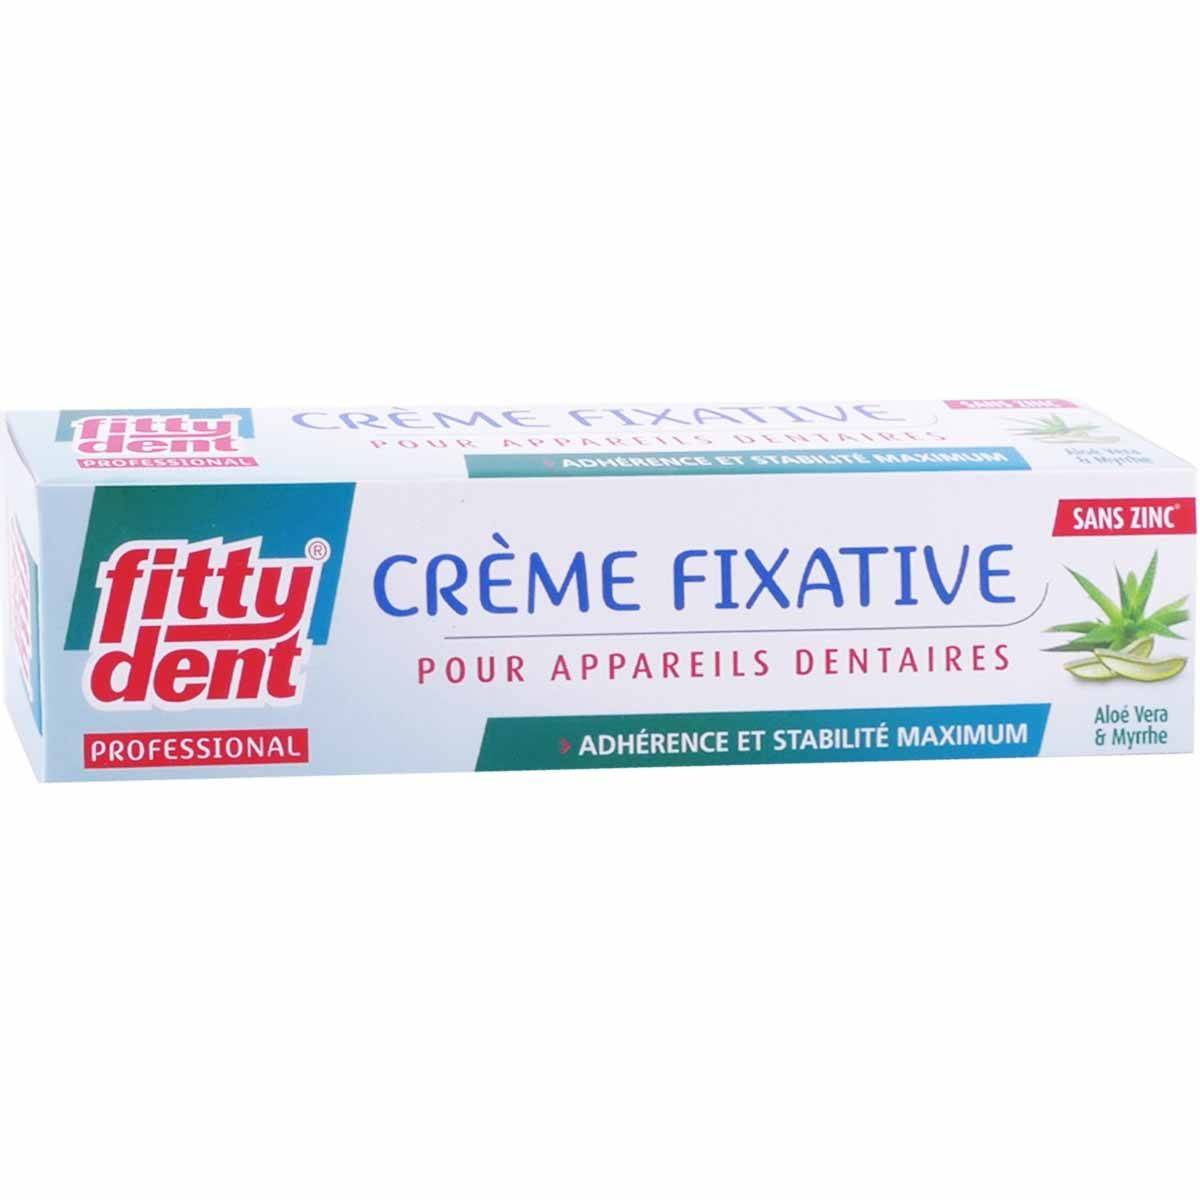 Fittydent creme fixative aloe vera myrrhe 40g